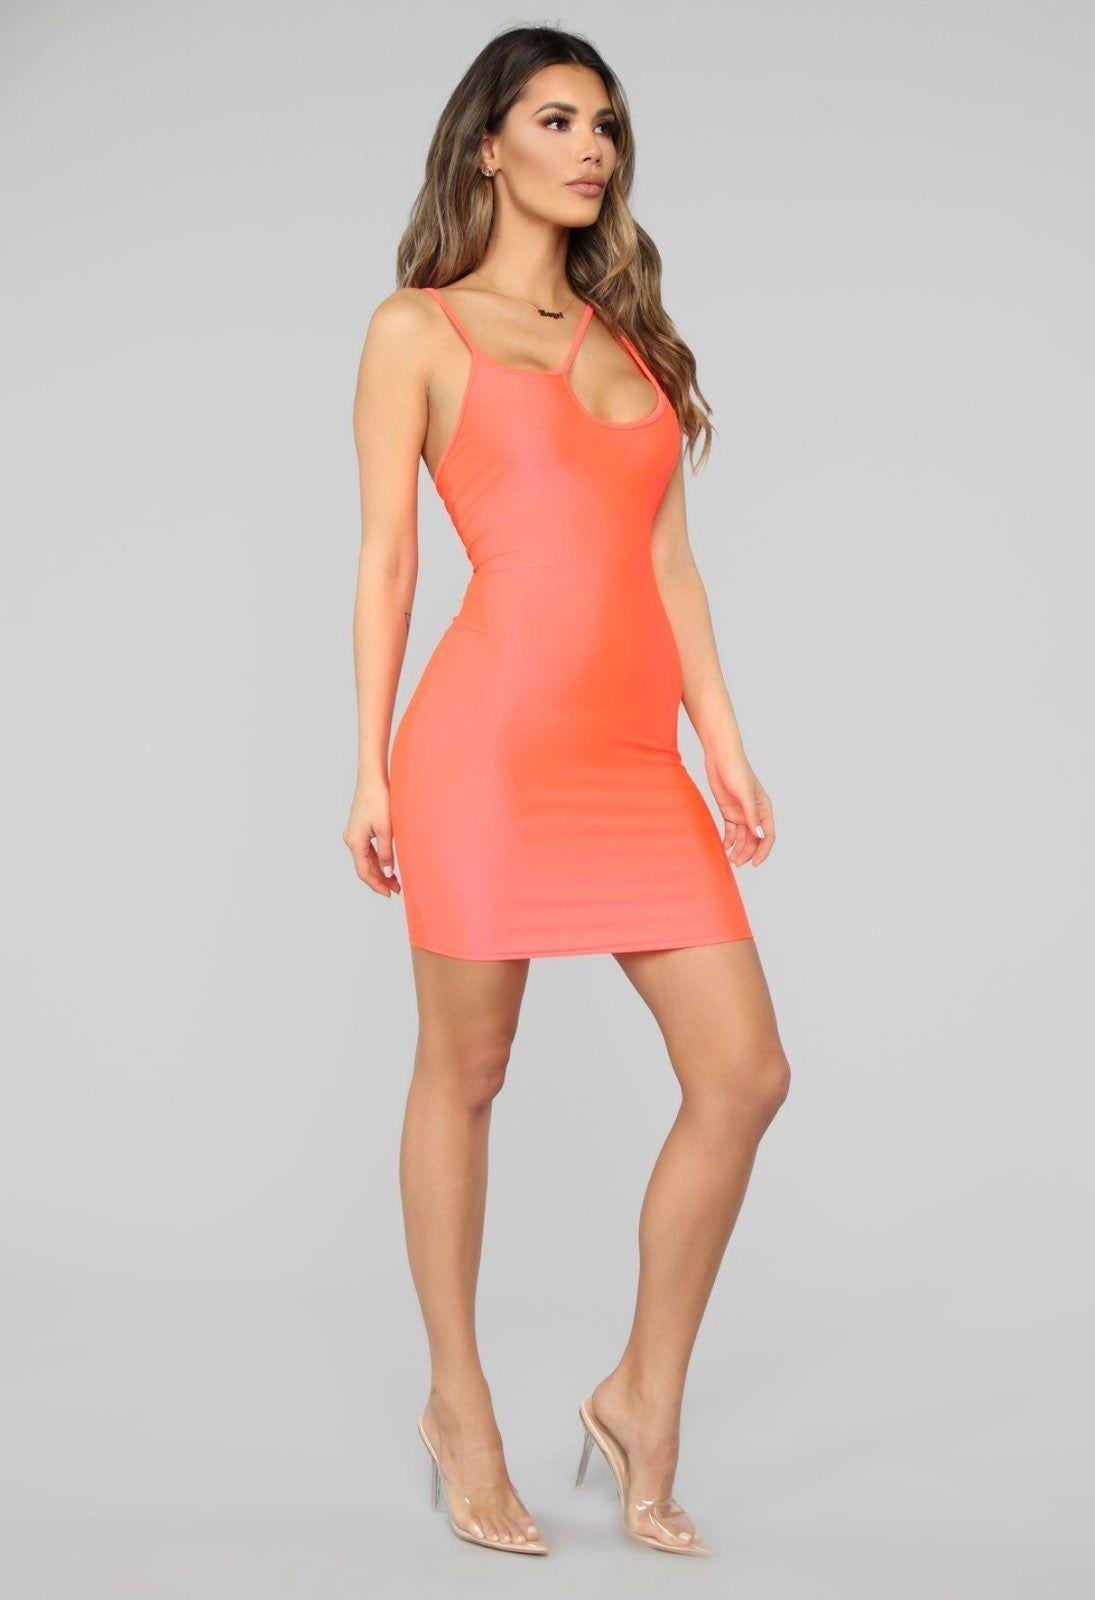 Park Art|My WordPress Blog_Neon Orange Dress Fashion Nova